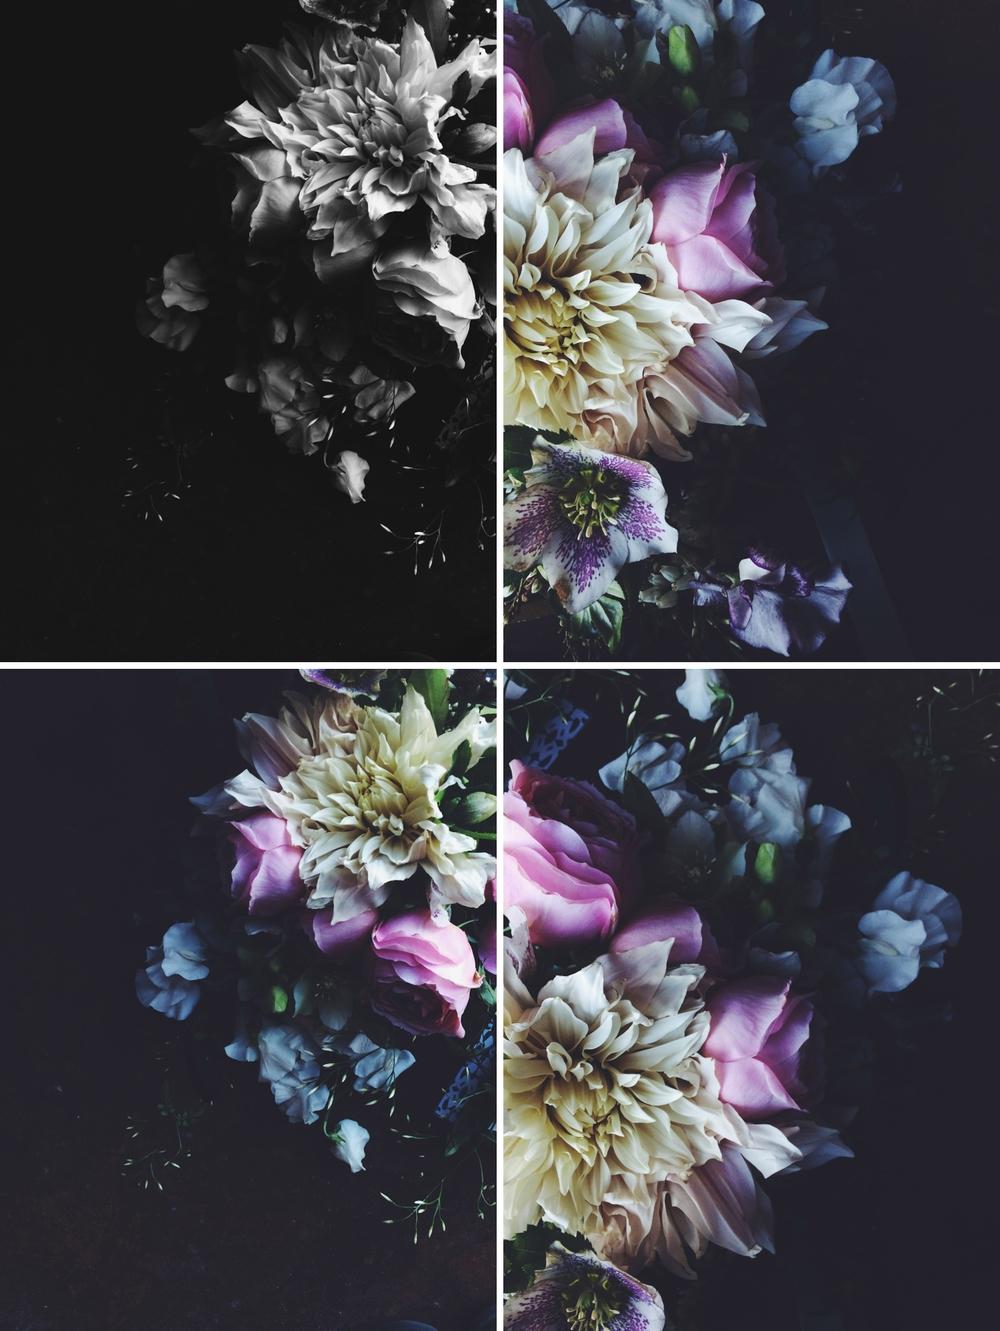 BTS images photographed for Geraldine Press, Botanical Series